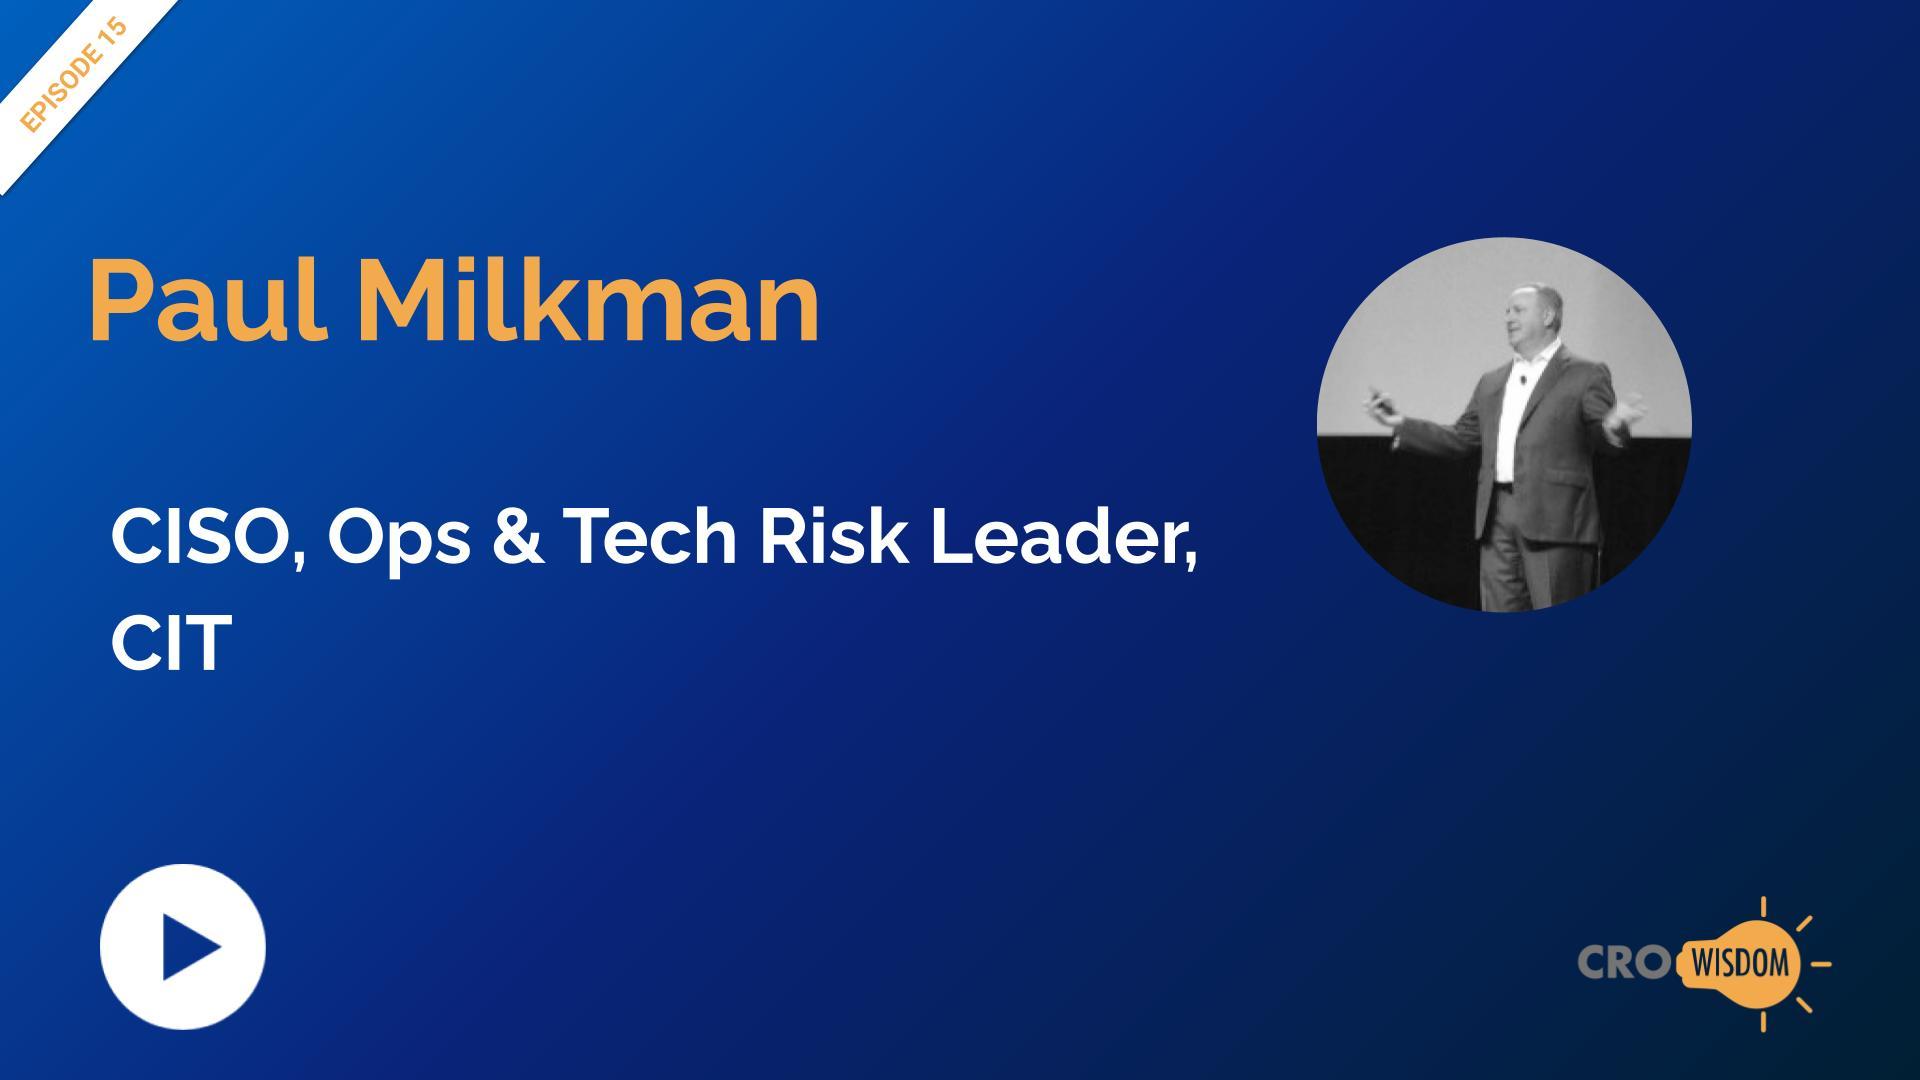 CRO Wisdom Episode 15 with Paul Milkman, CISO at CIT